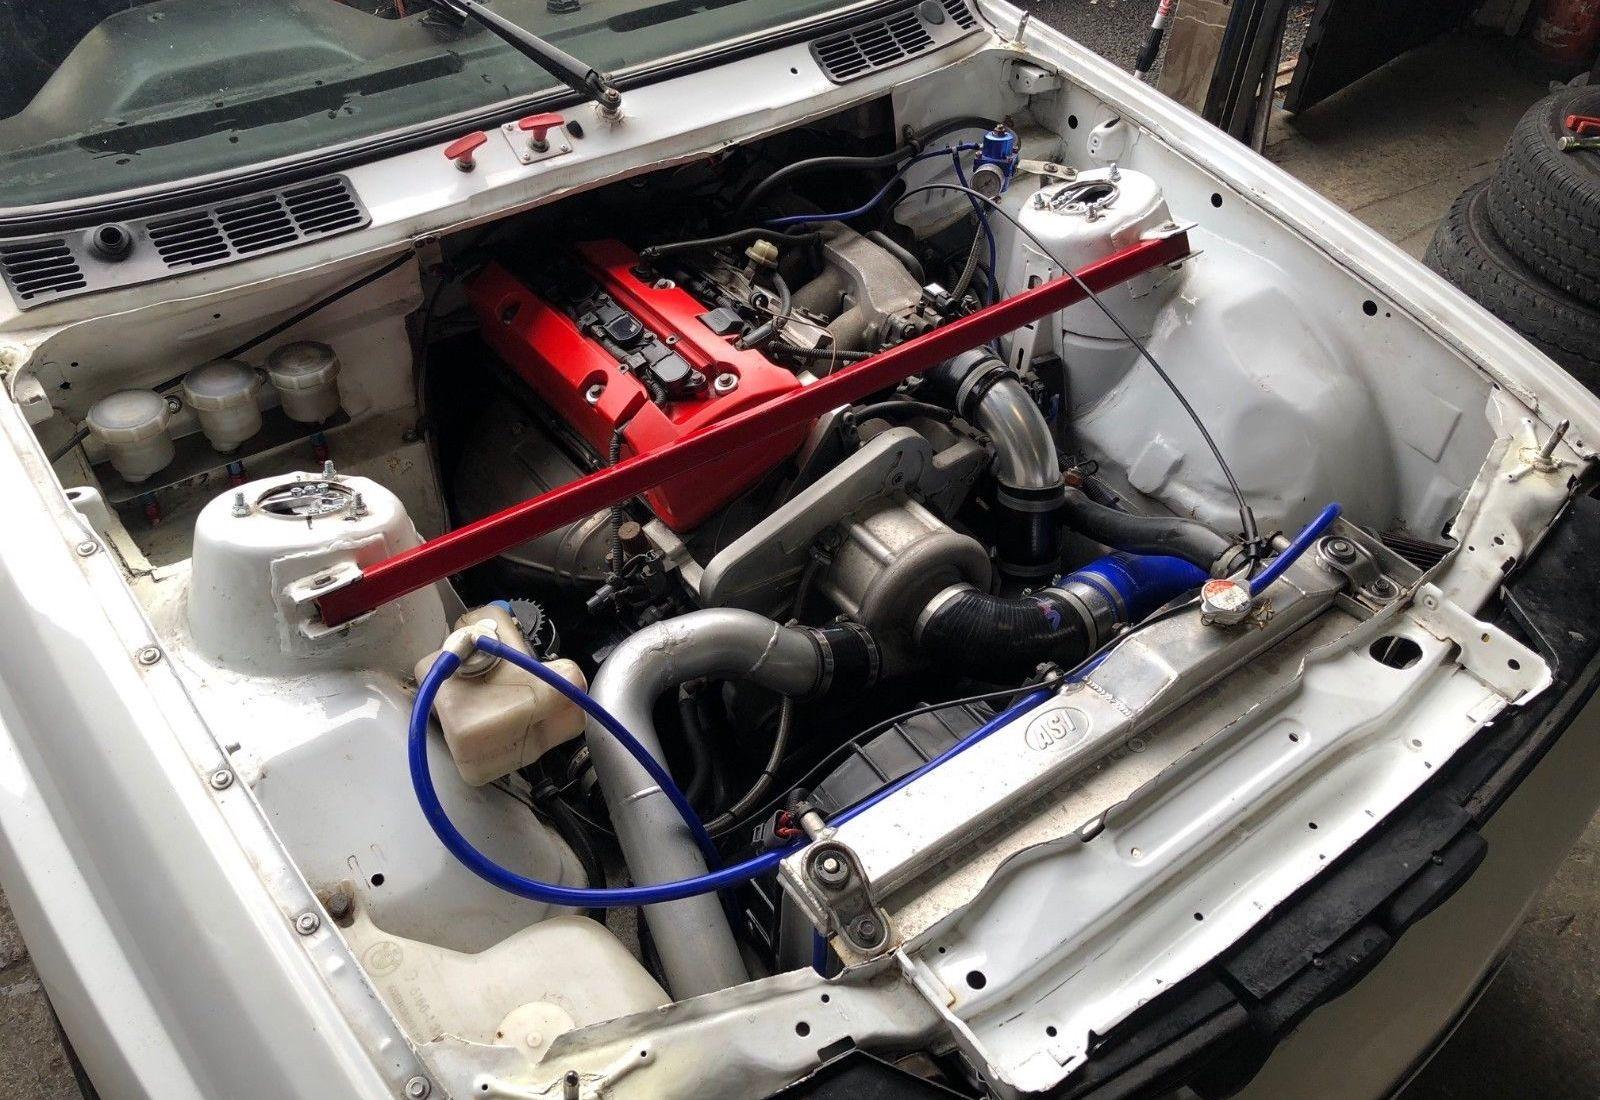 Bmw E Series With Honda F Engine Conversion on Four Cylinder Engine Balance